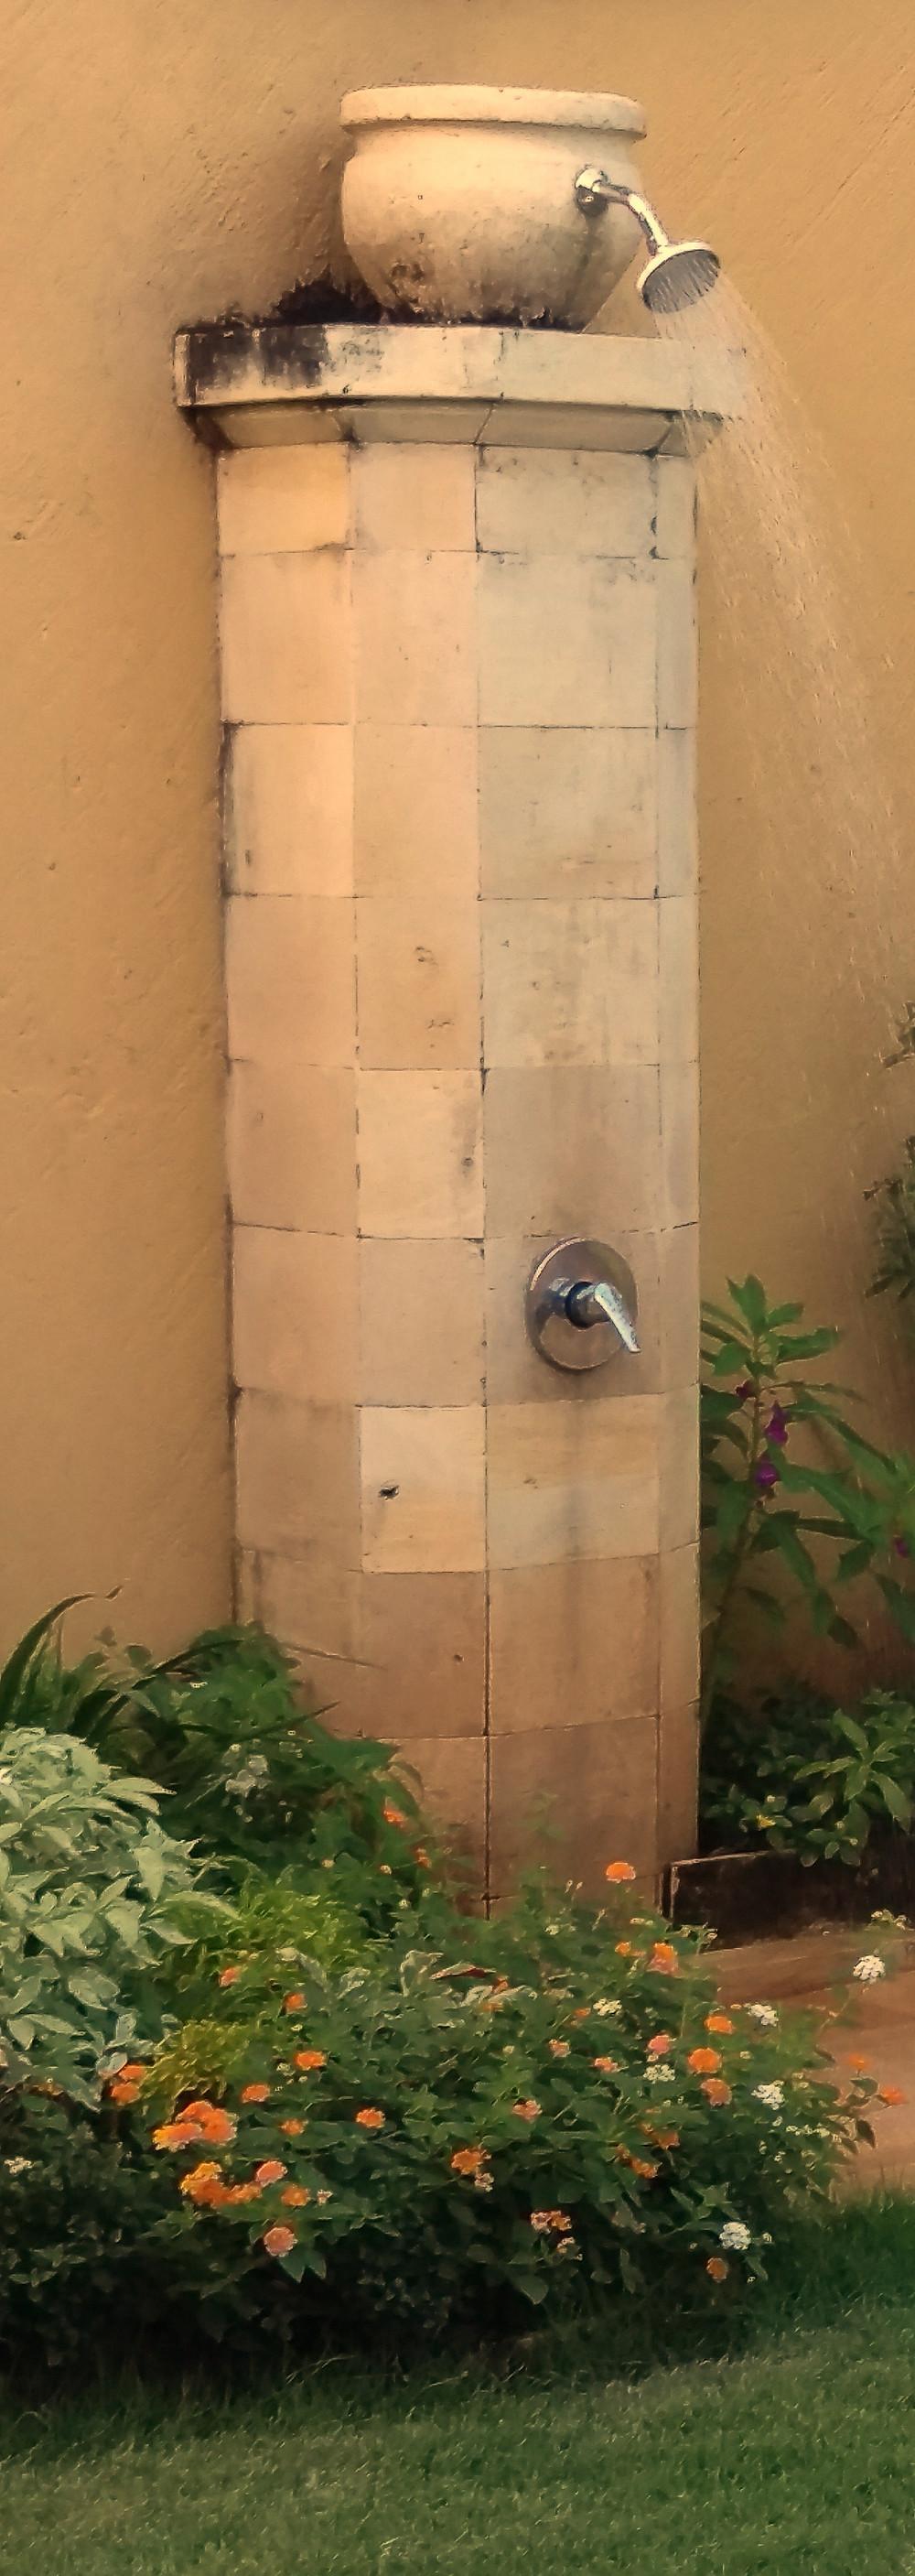 Outdoor Shower - Bali